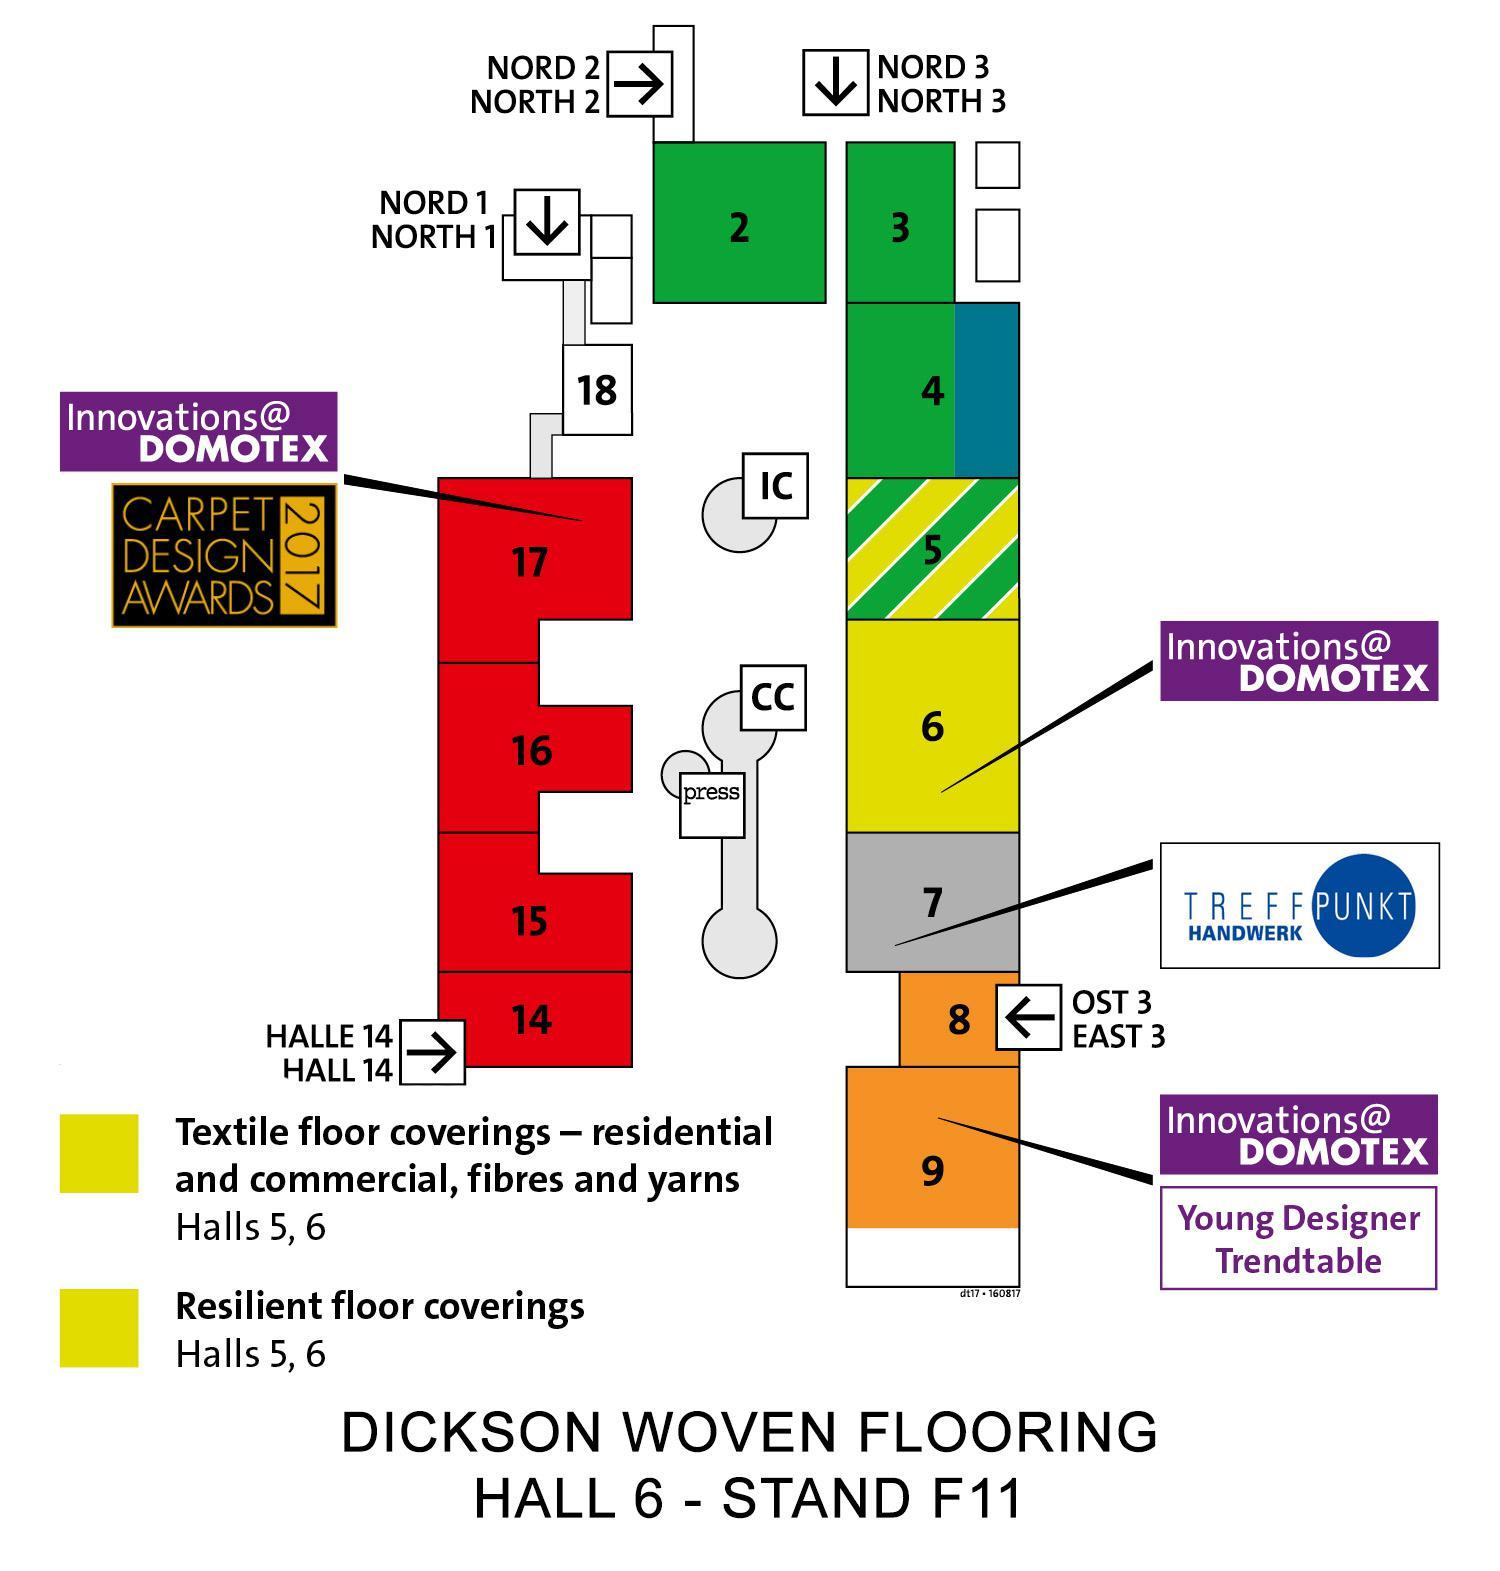 Domotex map